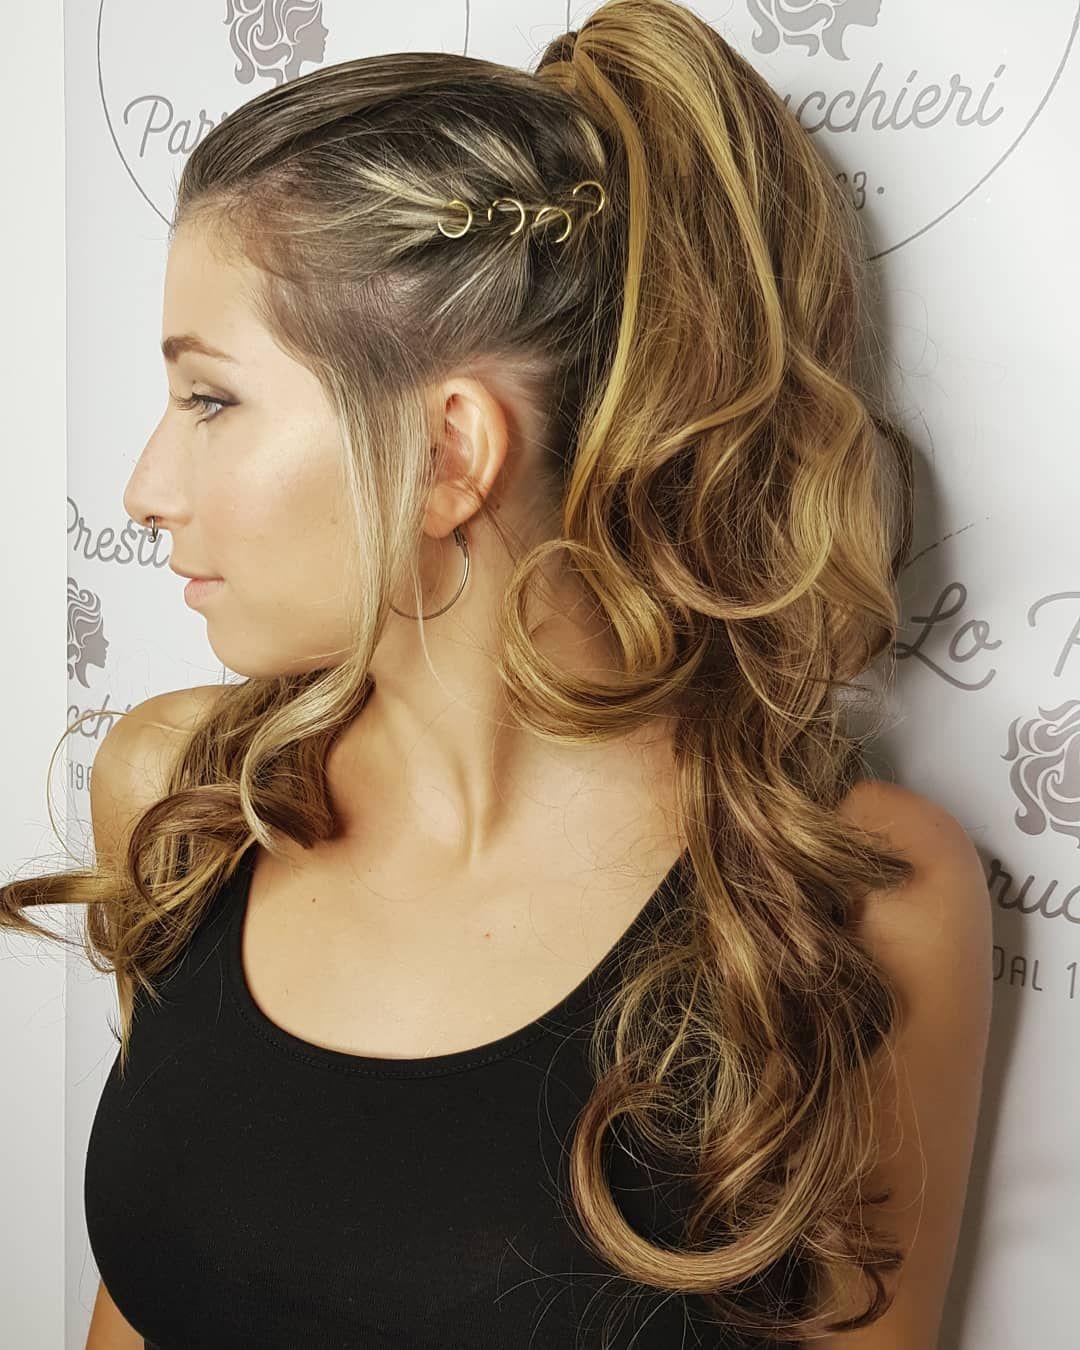 I 18 Anni Di Fabiana Hair Hairdresser Hairart Hairgoals Haircolor Hairstyle Ponytail Birthday Birthdaypart Hair Party Hairstyles Hair Styles